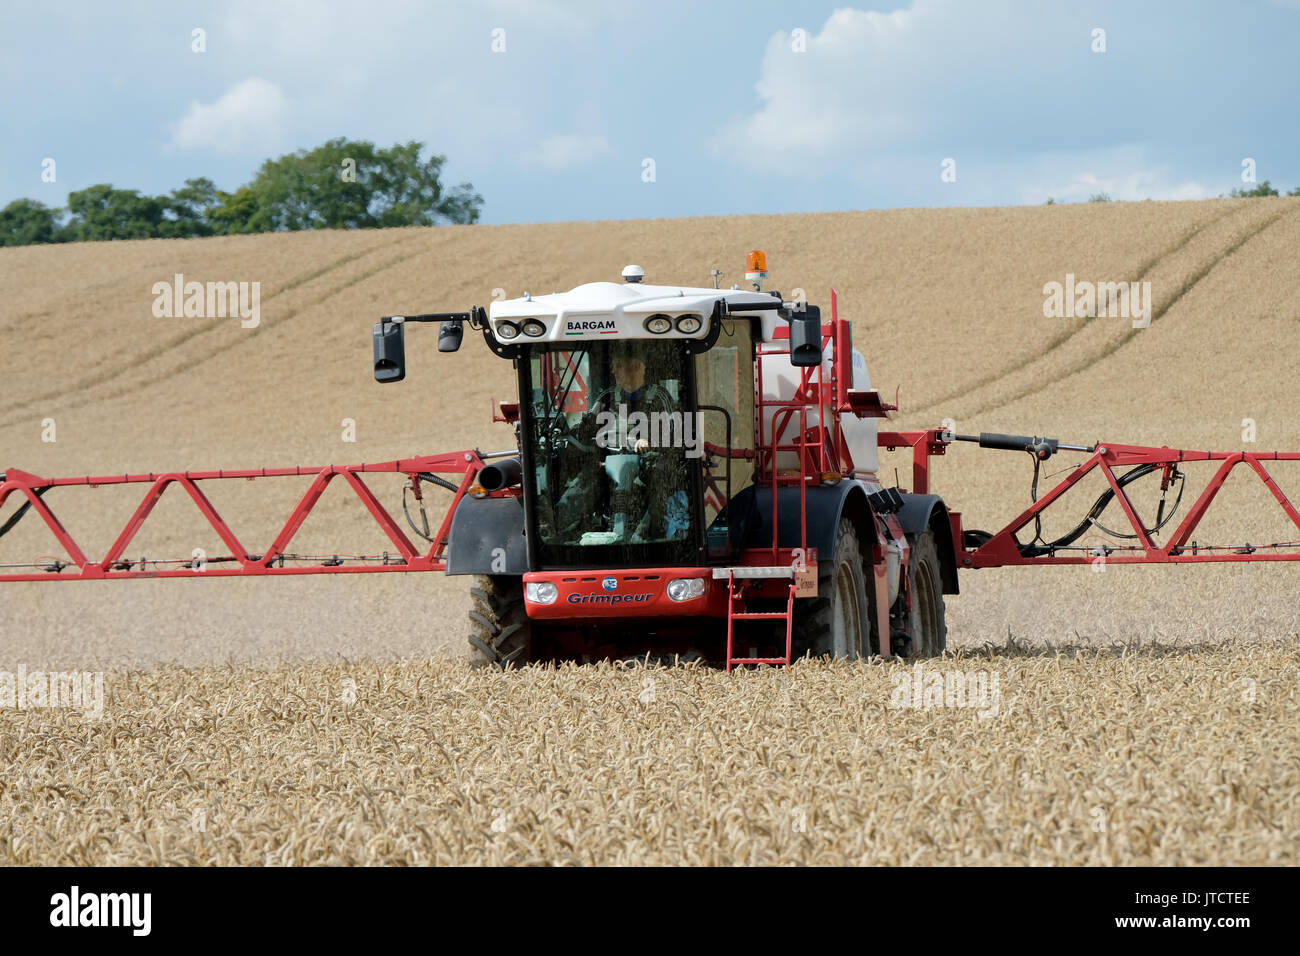 A crop spraying machine spraying a wheat field in West Lothian, Scotland. - Stock Image